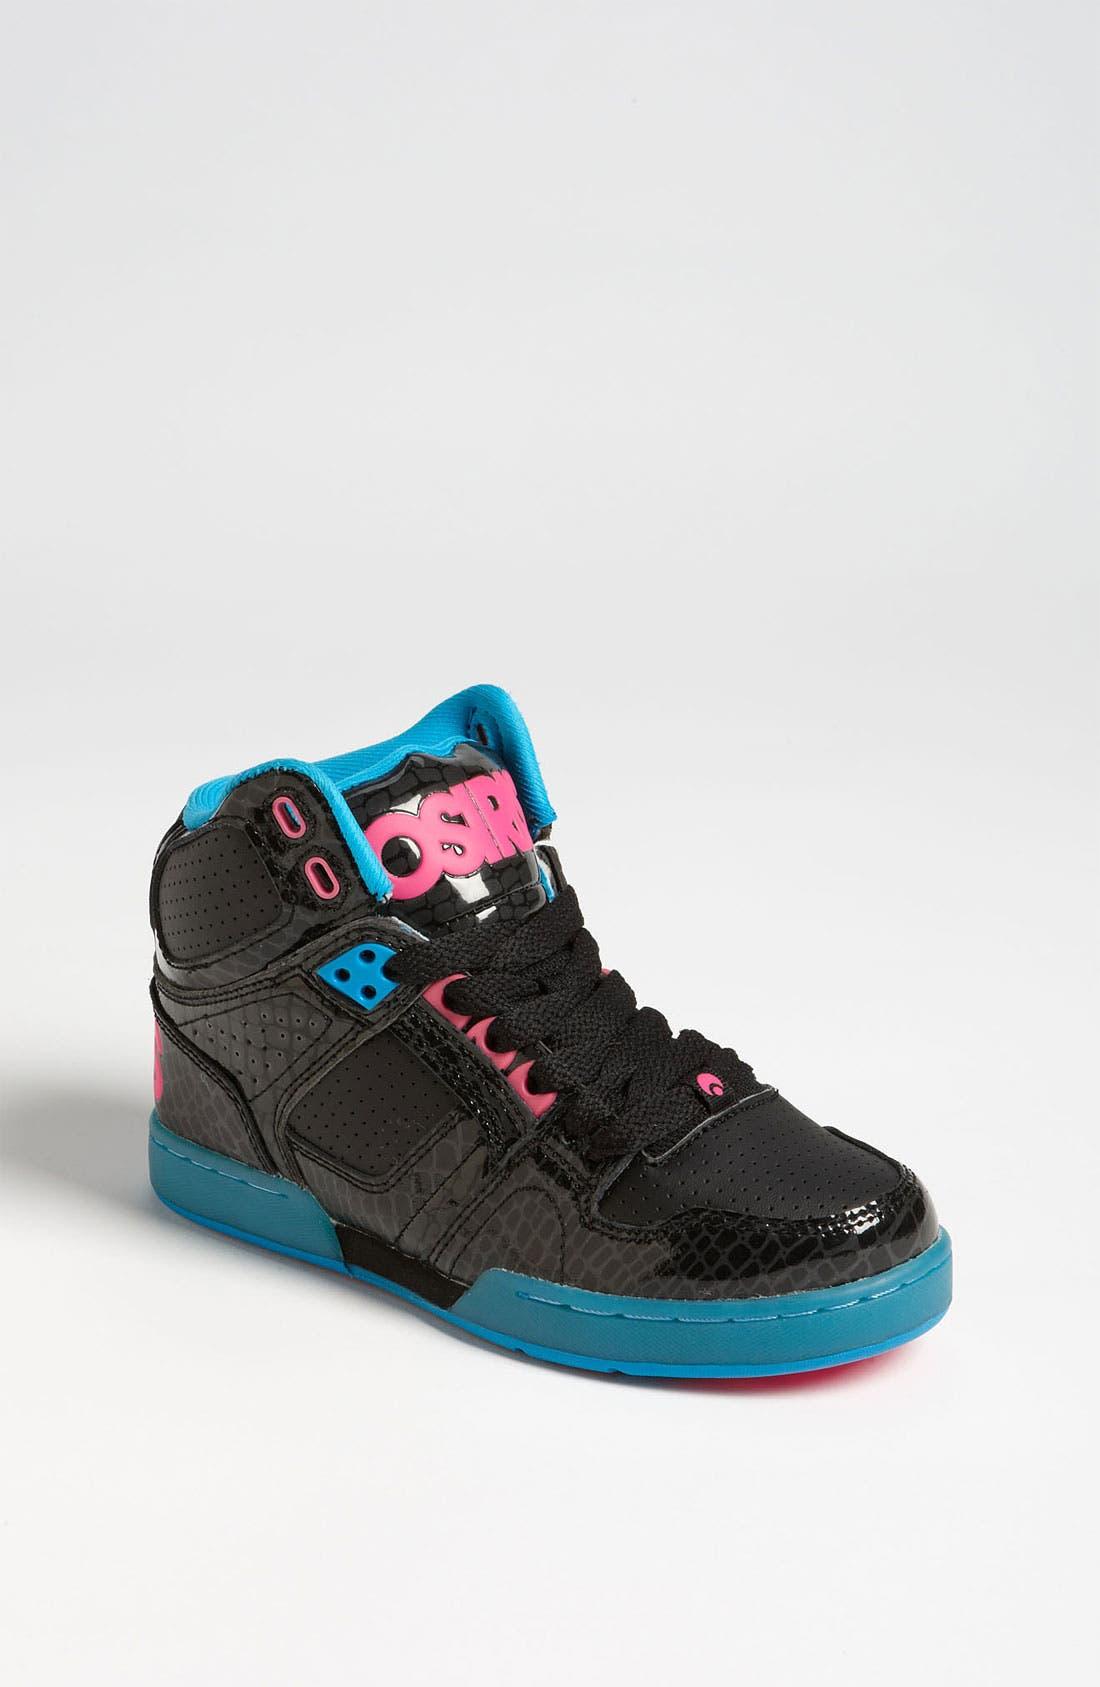 Main Image - Osiris 'NYC 83 Slim' Sneaker (Toddler, Little Kid & Big Kid)